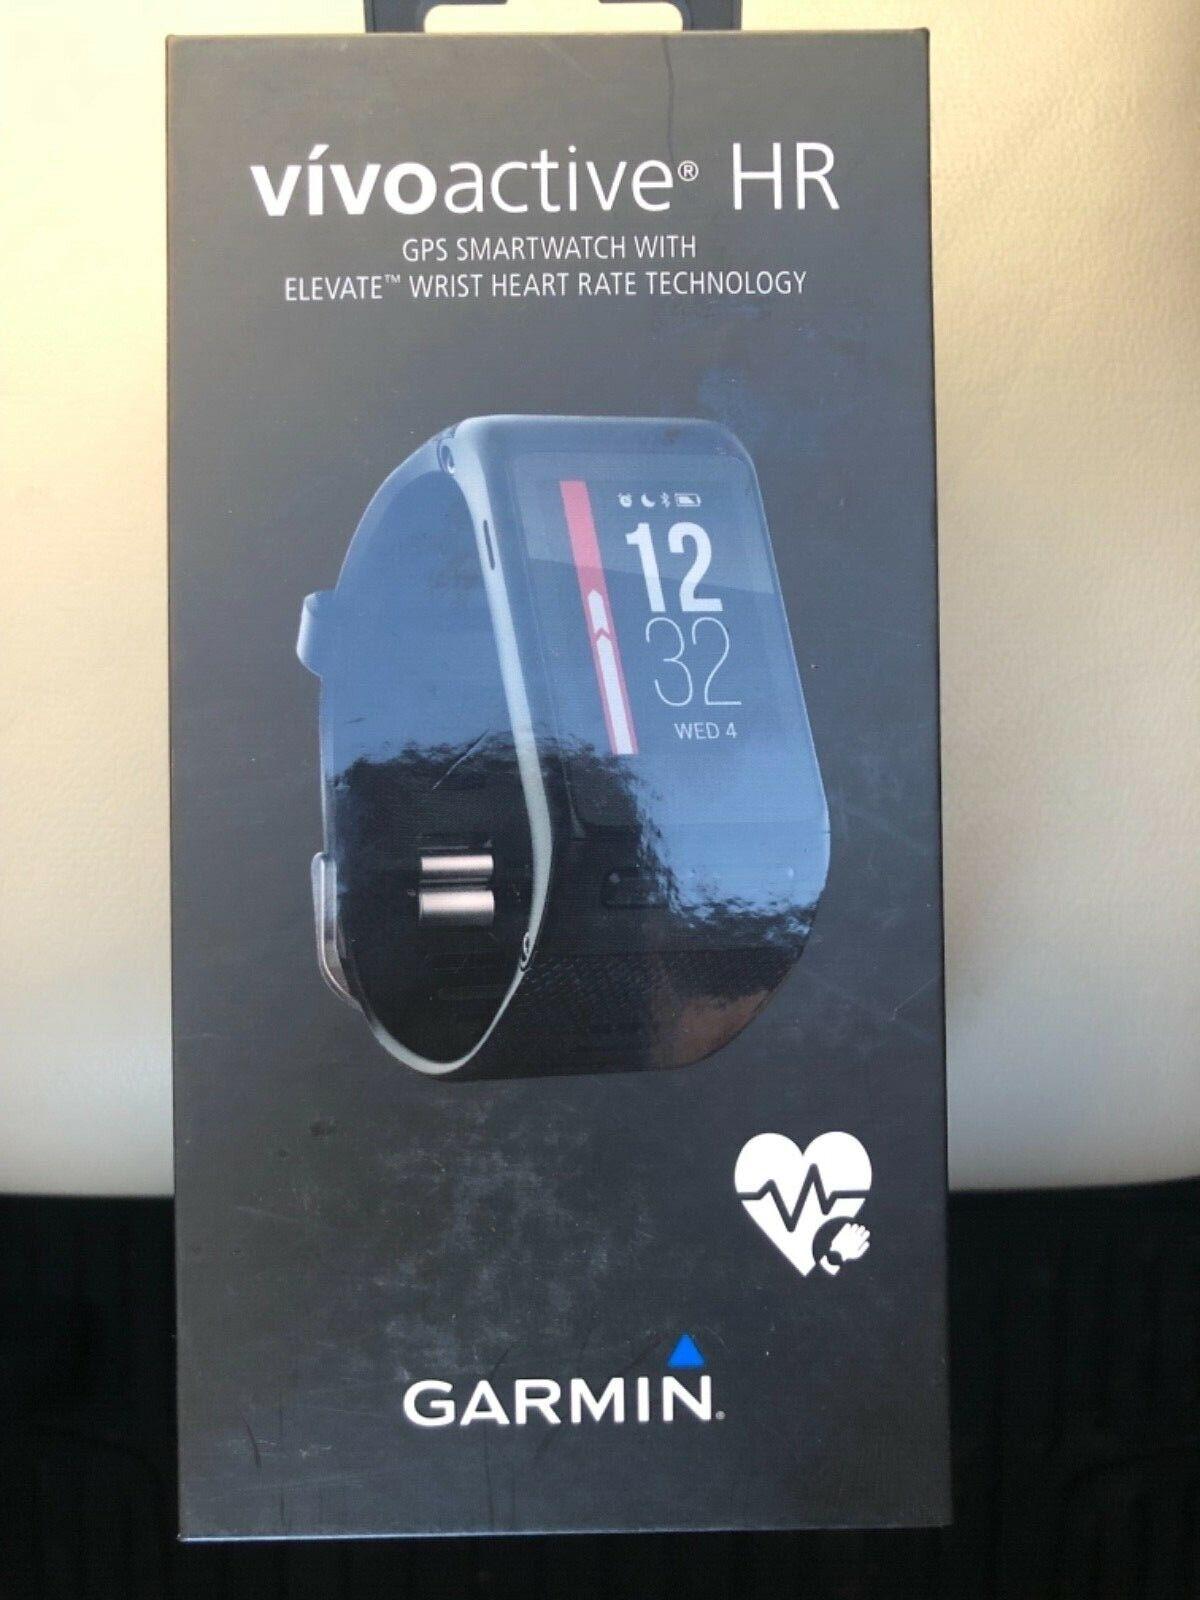 Garmin VivoActive HR GPS Smartwatch 010-01605-03, NEW IN SEALED BOX